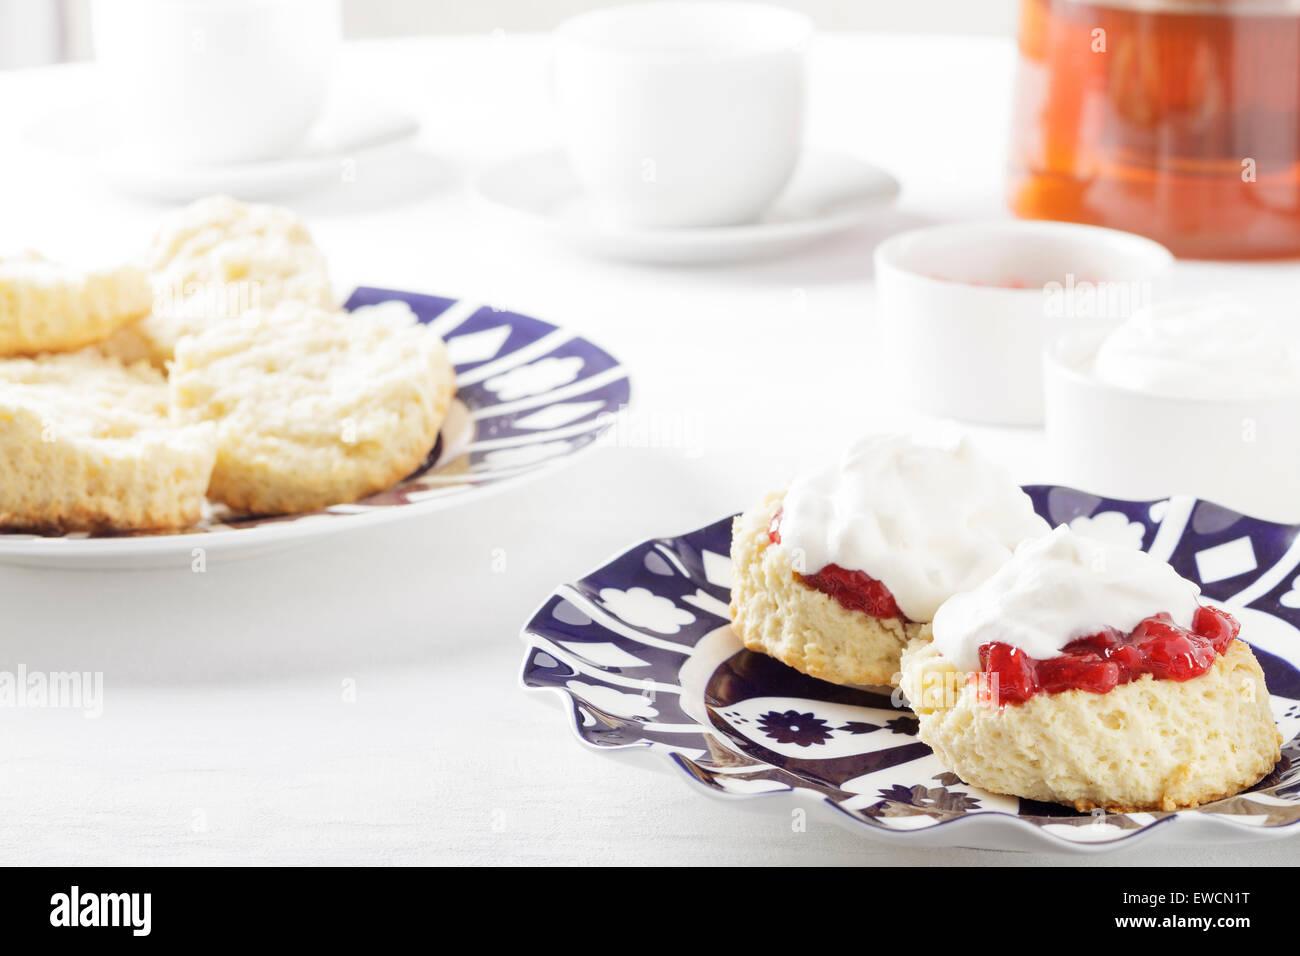 Scones with jam and cream - Stock Image